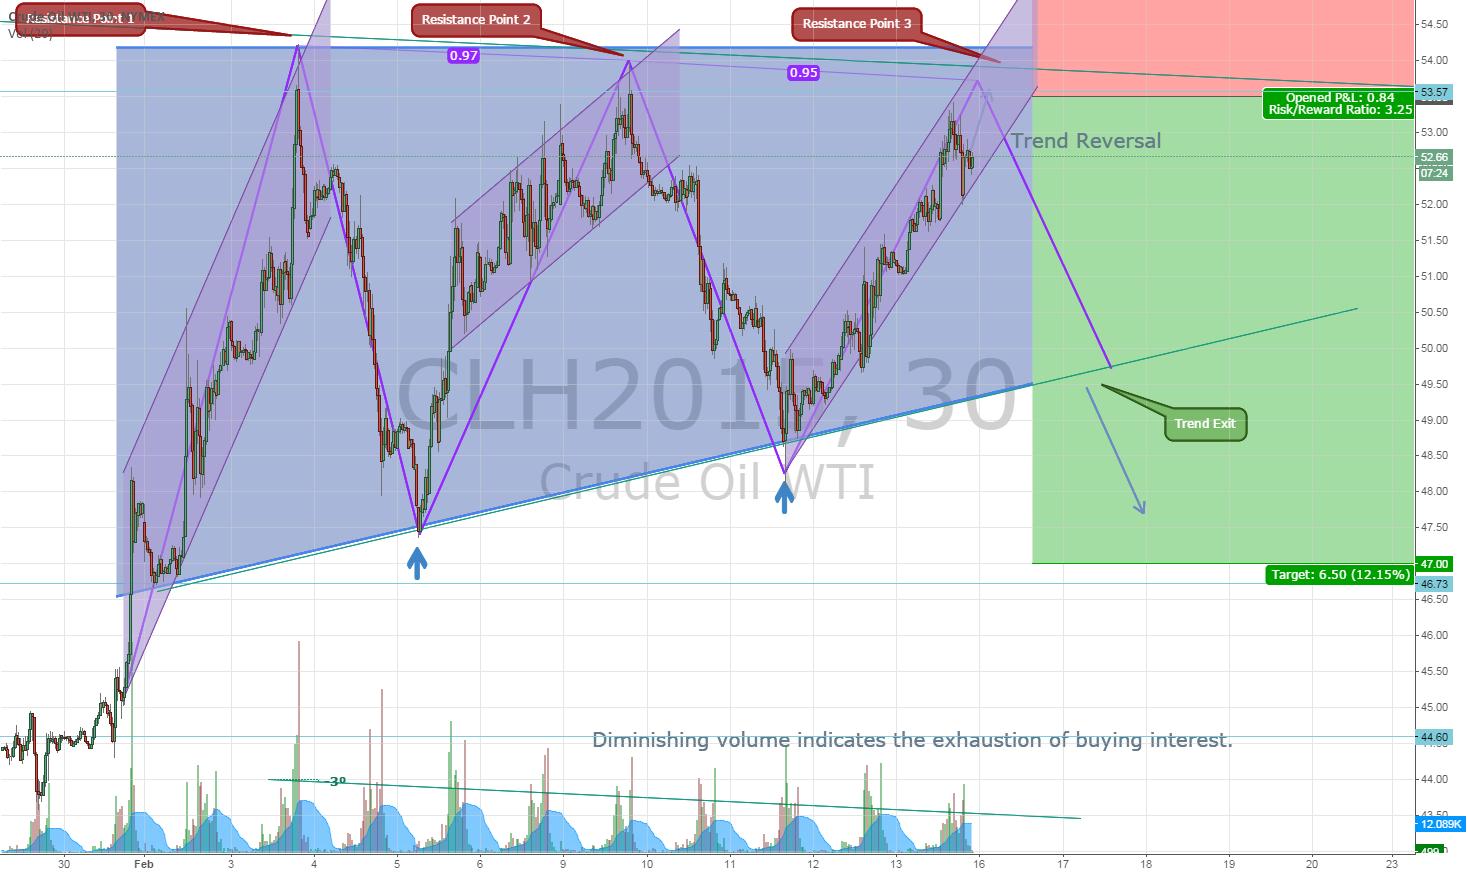 Crude Oil WTI: 14 Day Trend Reversal (Triple Tops)